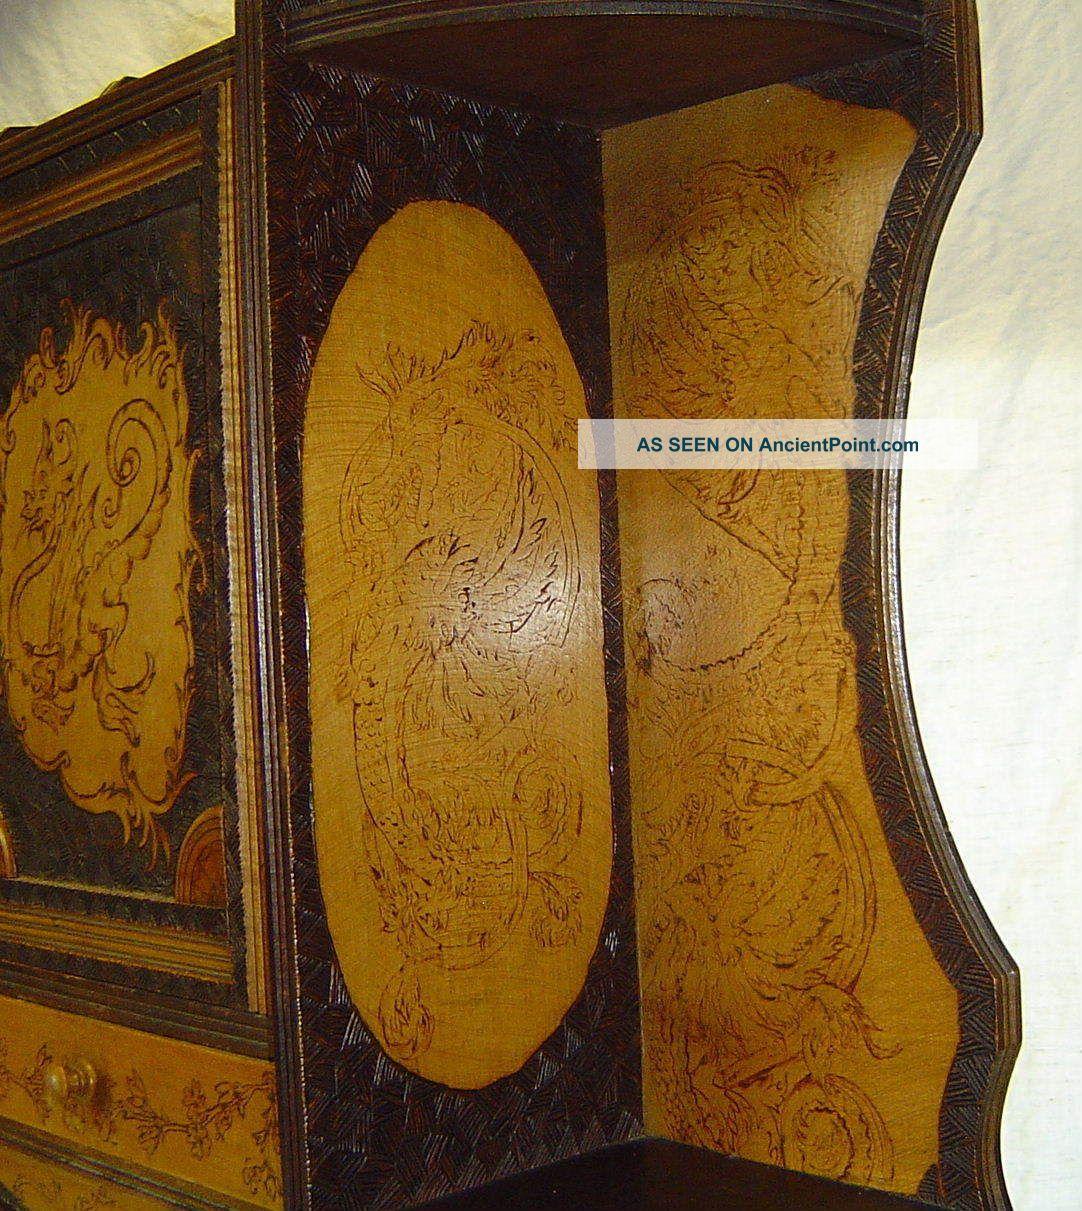 dragon age bedroom key dcdcapital com inexpensive bedroom furniture inexpensive bedroom